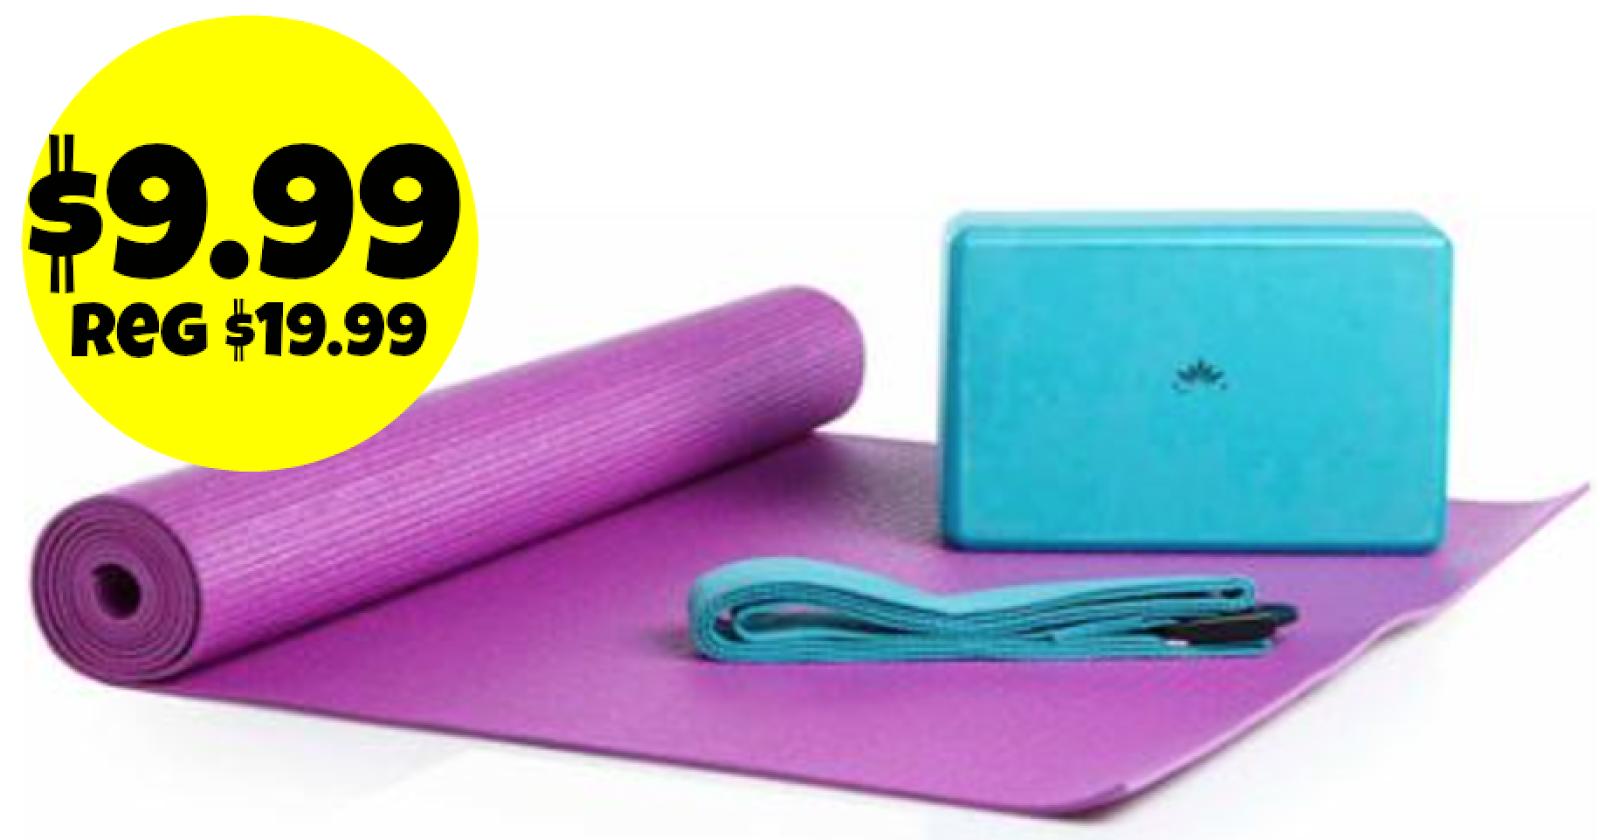 http://www.thebinderladies.com/2015/01/walmart-lotus-yoga-kit-mat-block-strap.html